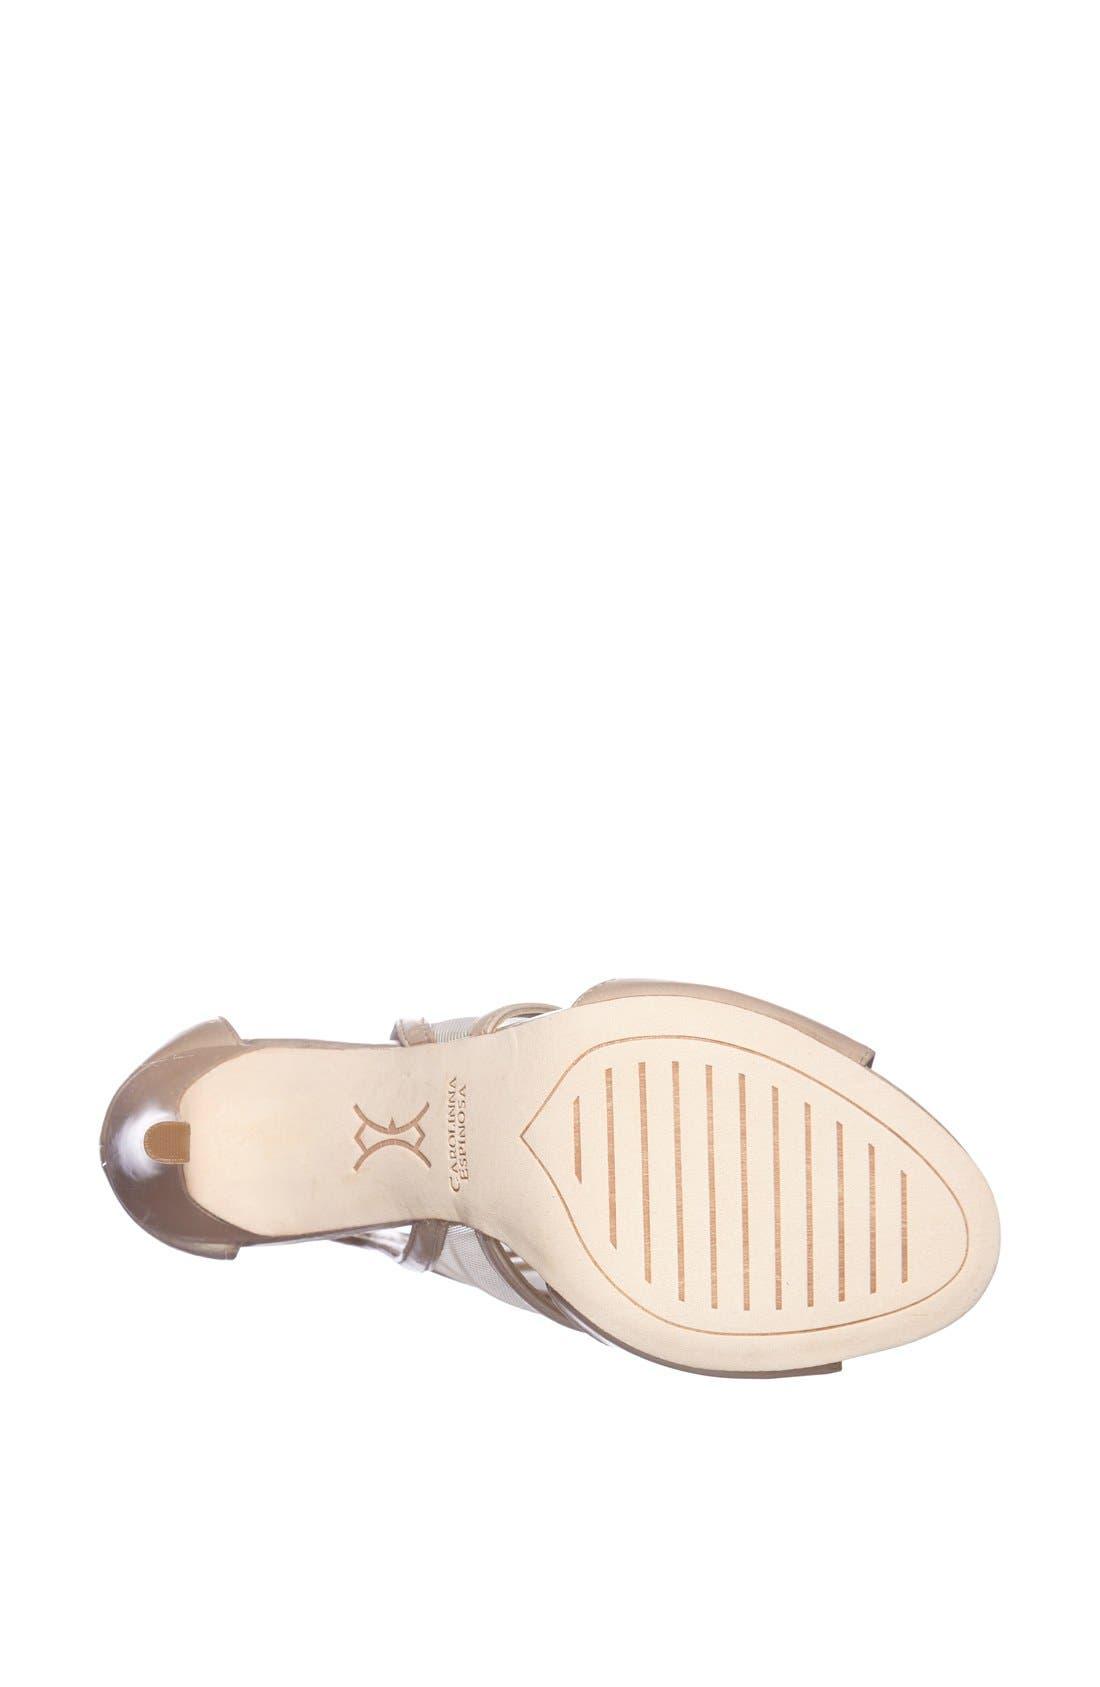 Alternate Image 4  - Carolinna Espinosa 'Sammy' Leather Sandal